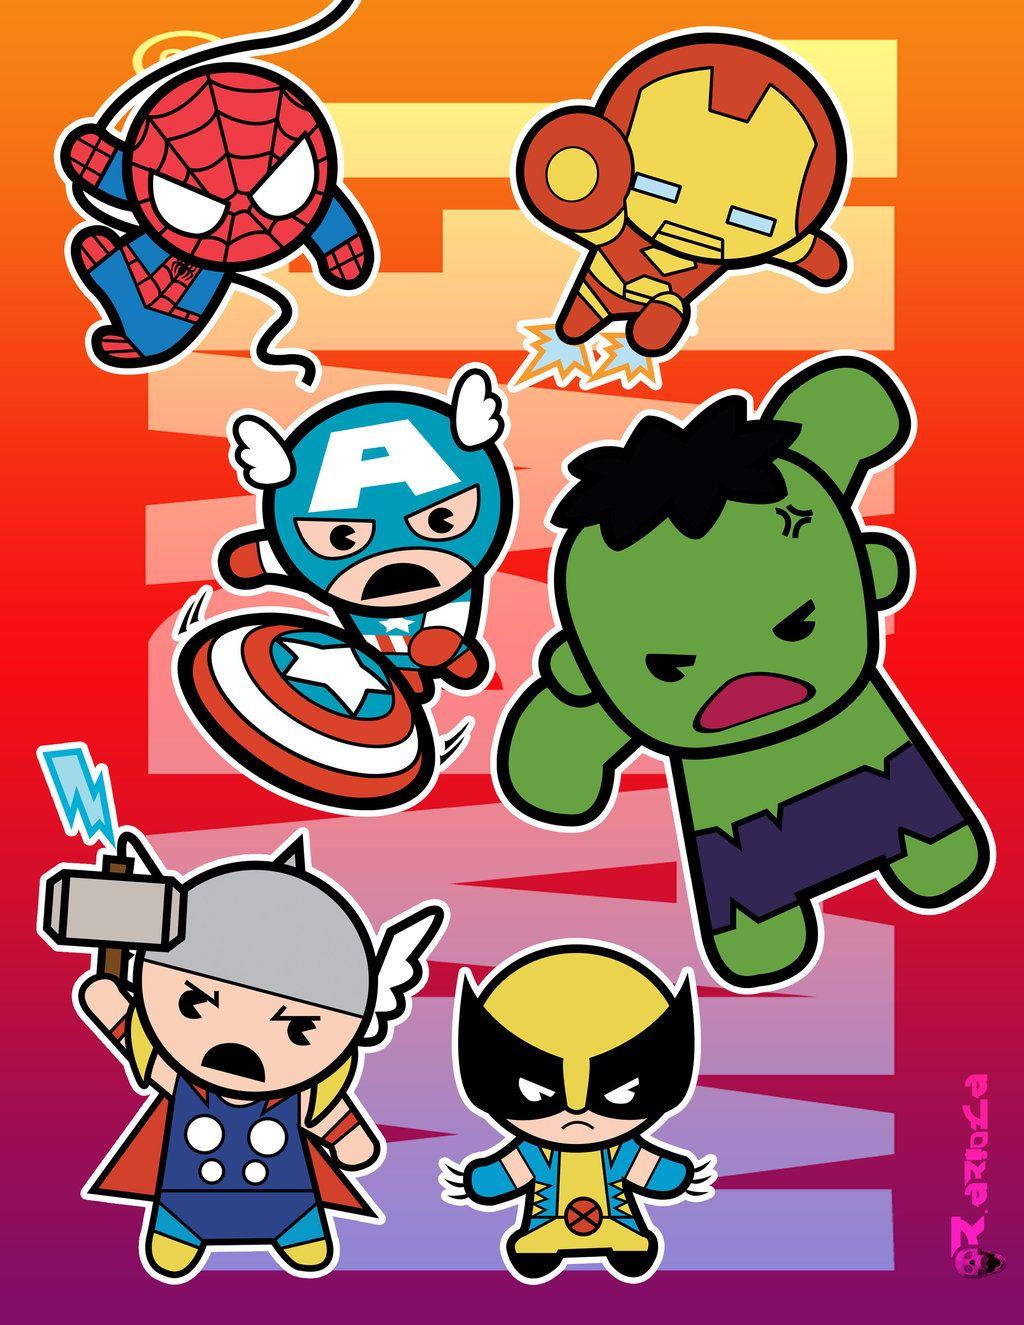 Super Héroes Marvel en Versión Chibi. | pide un deseo | Pinterest ...